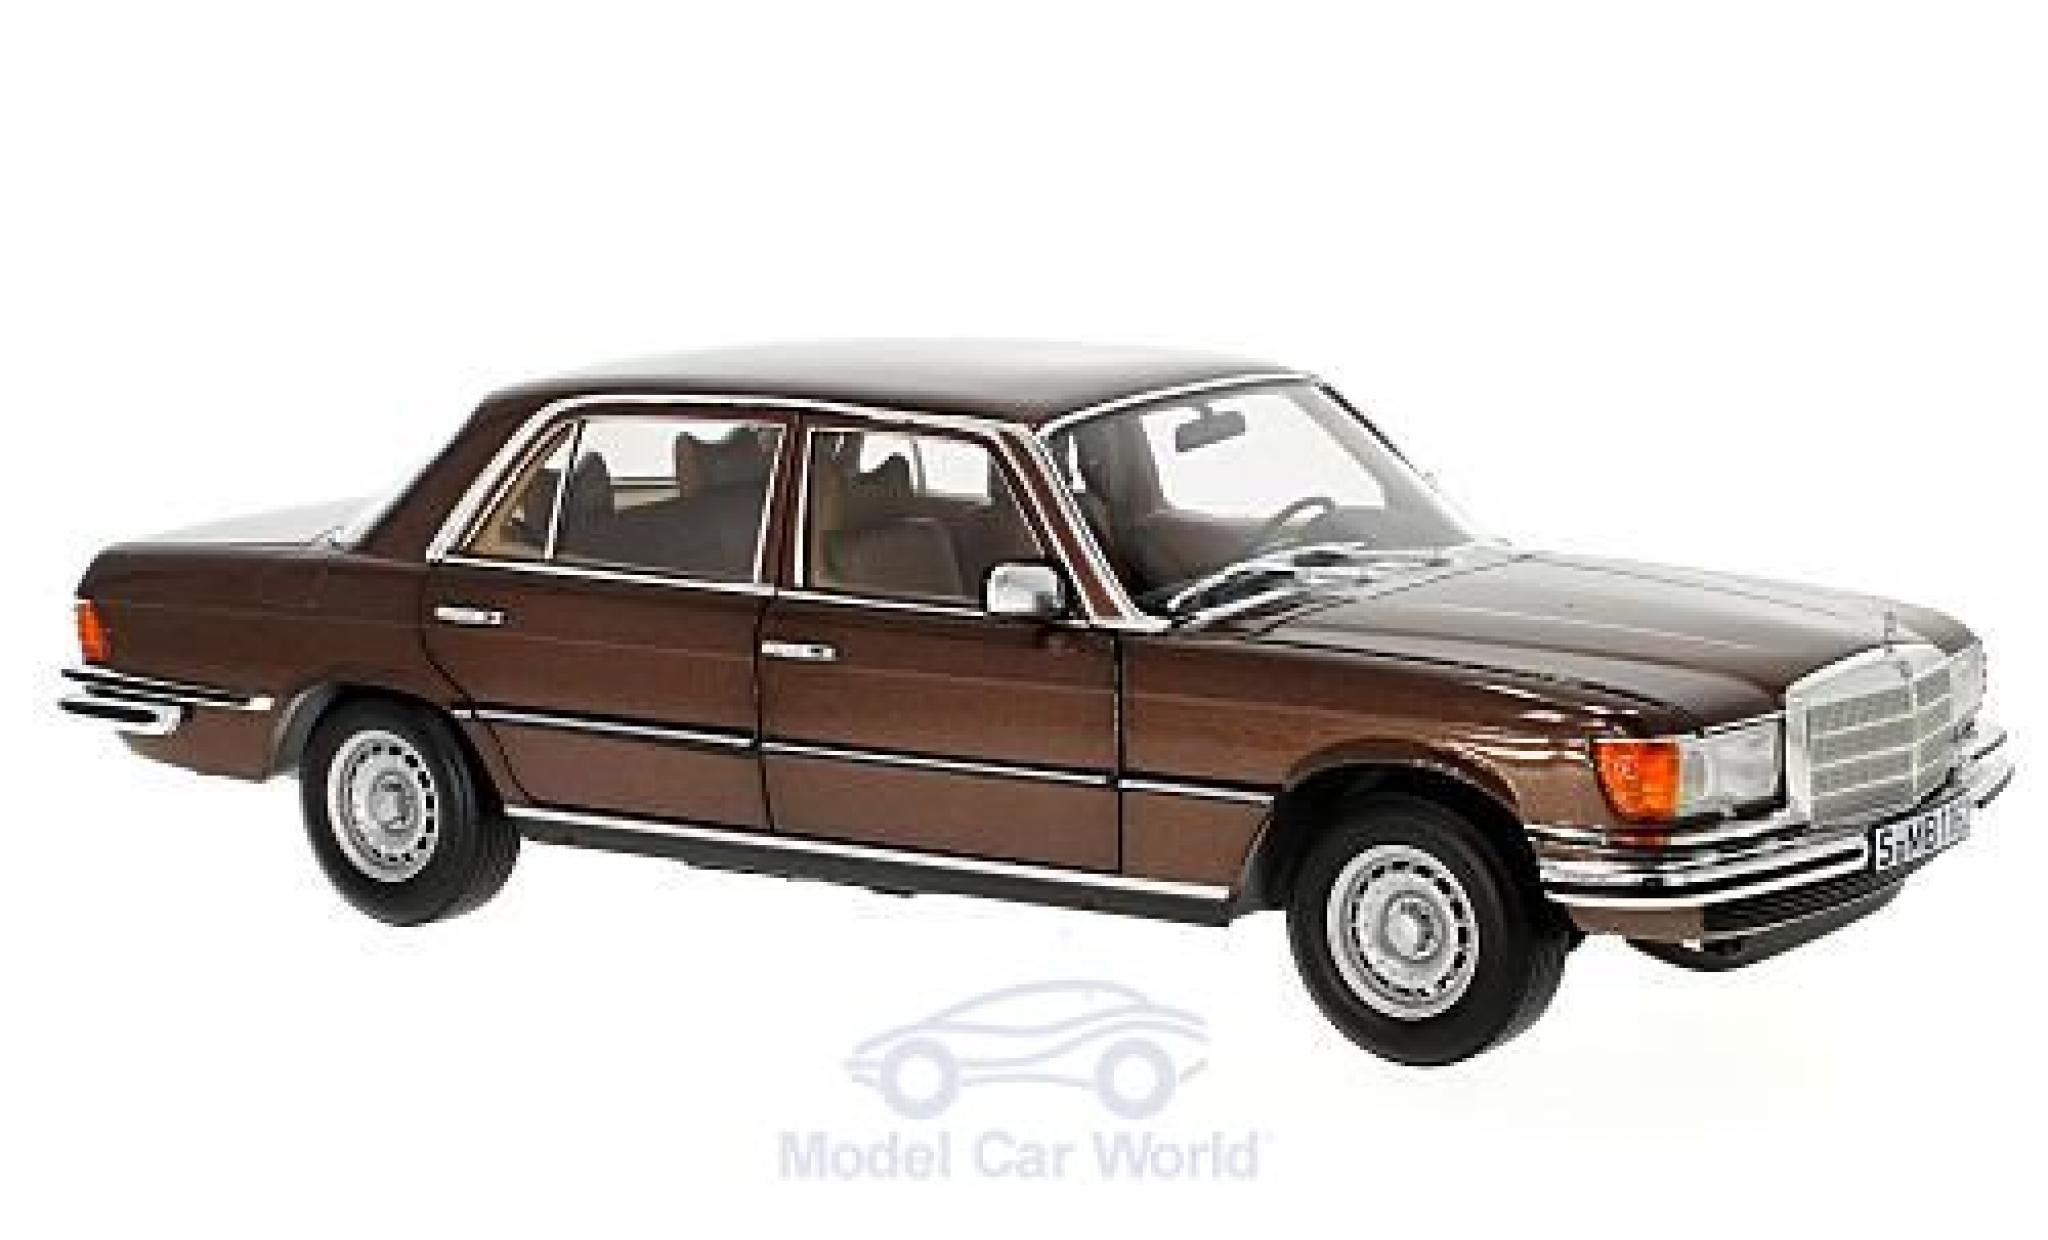 Mercedes 450 SEL 1/18 Norev SEL 6.9 (W116) metallic-marron 1976